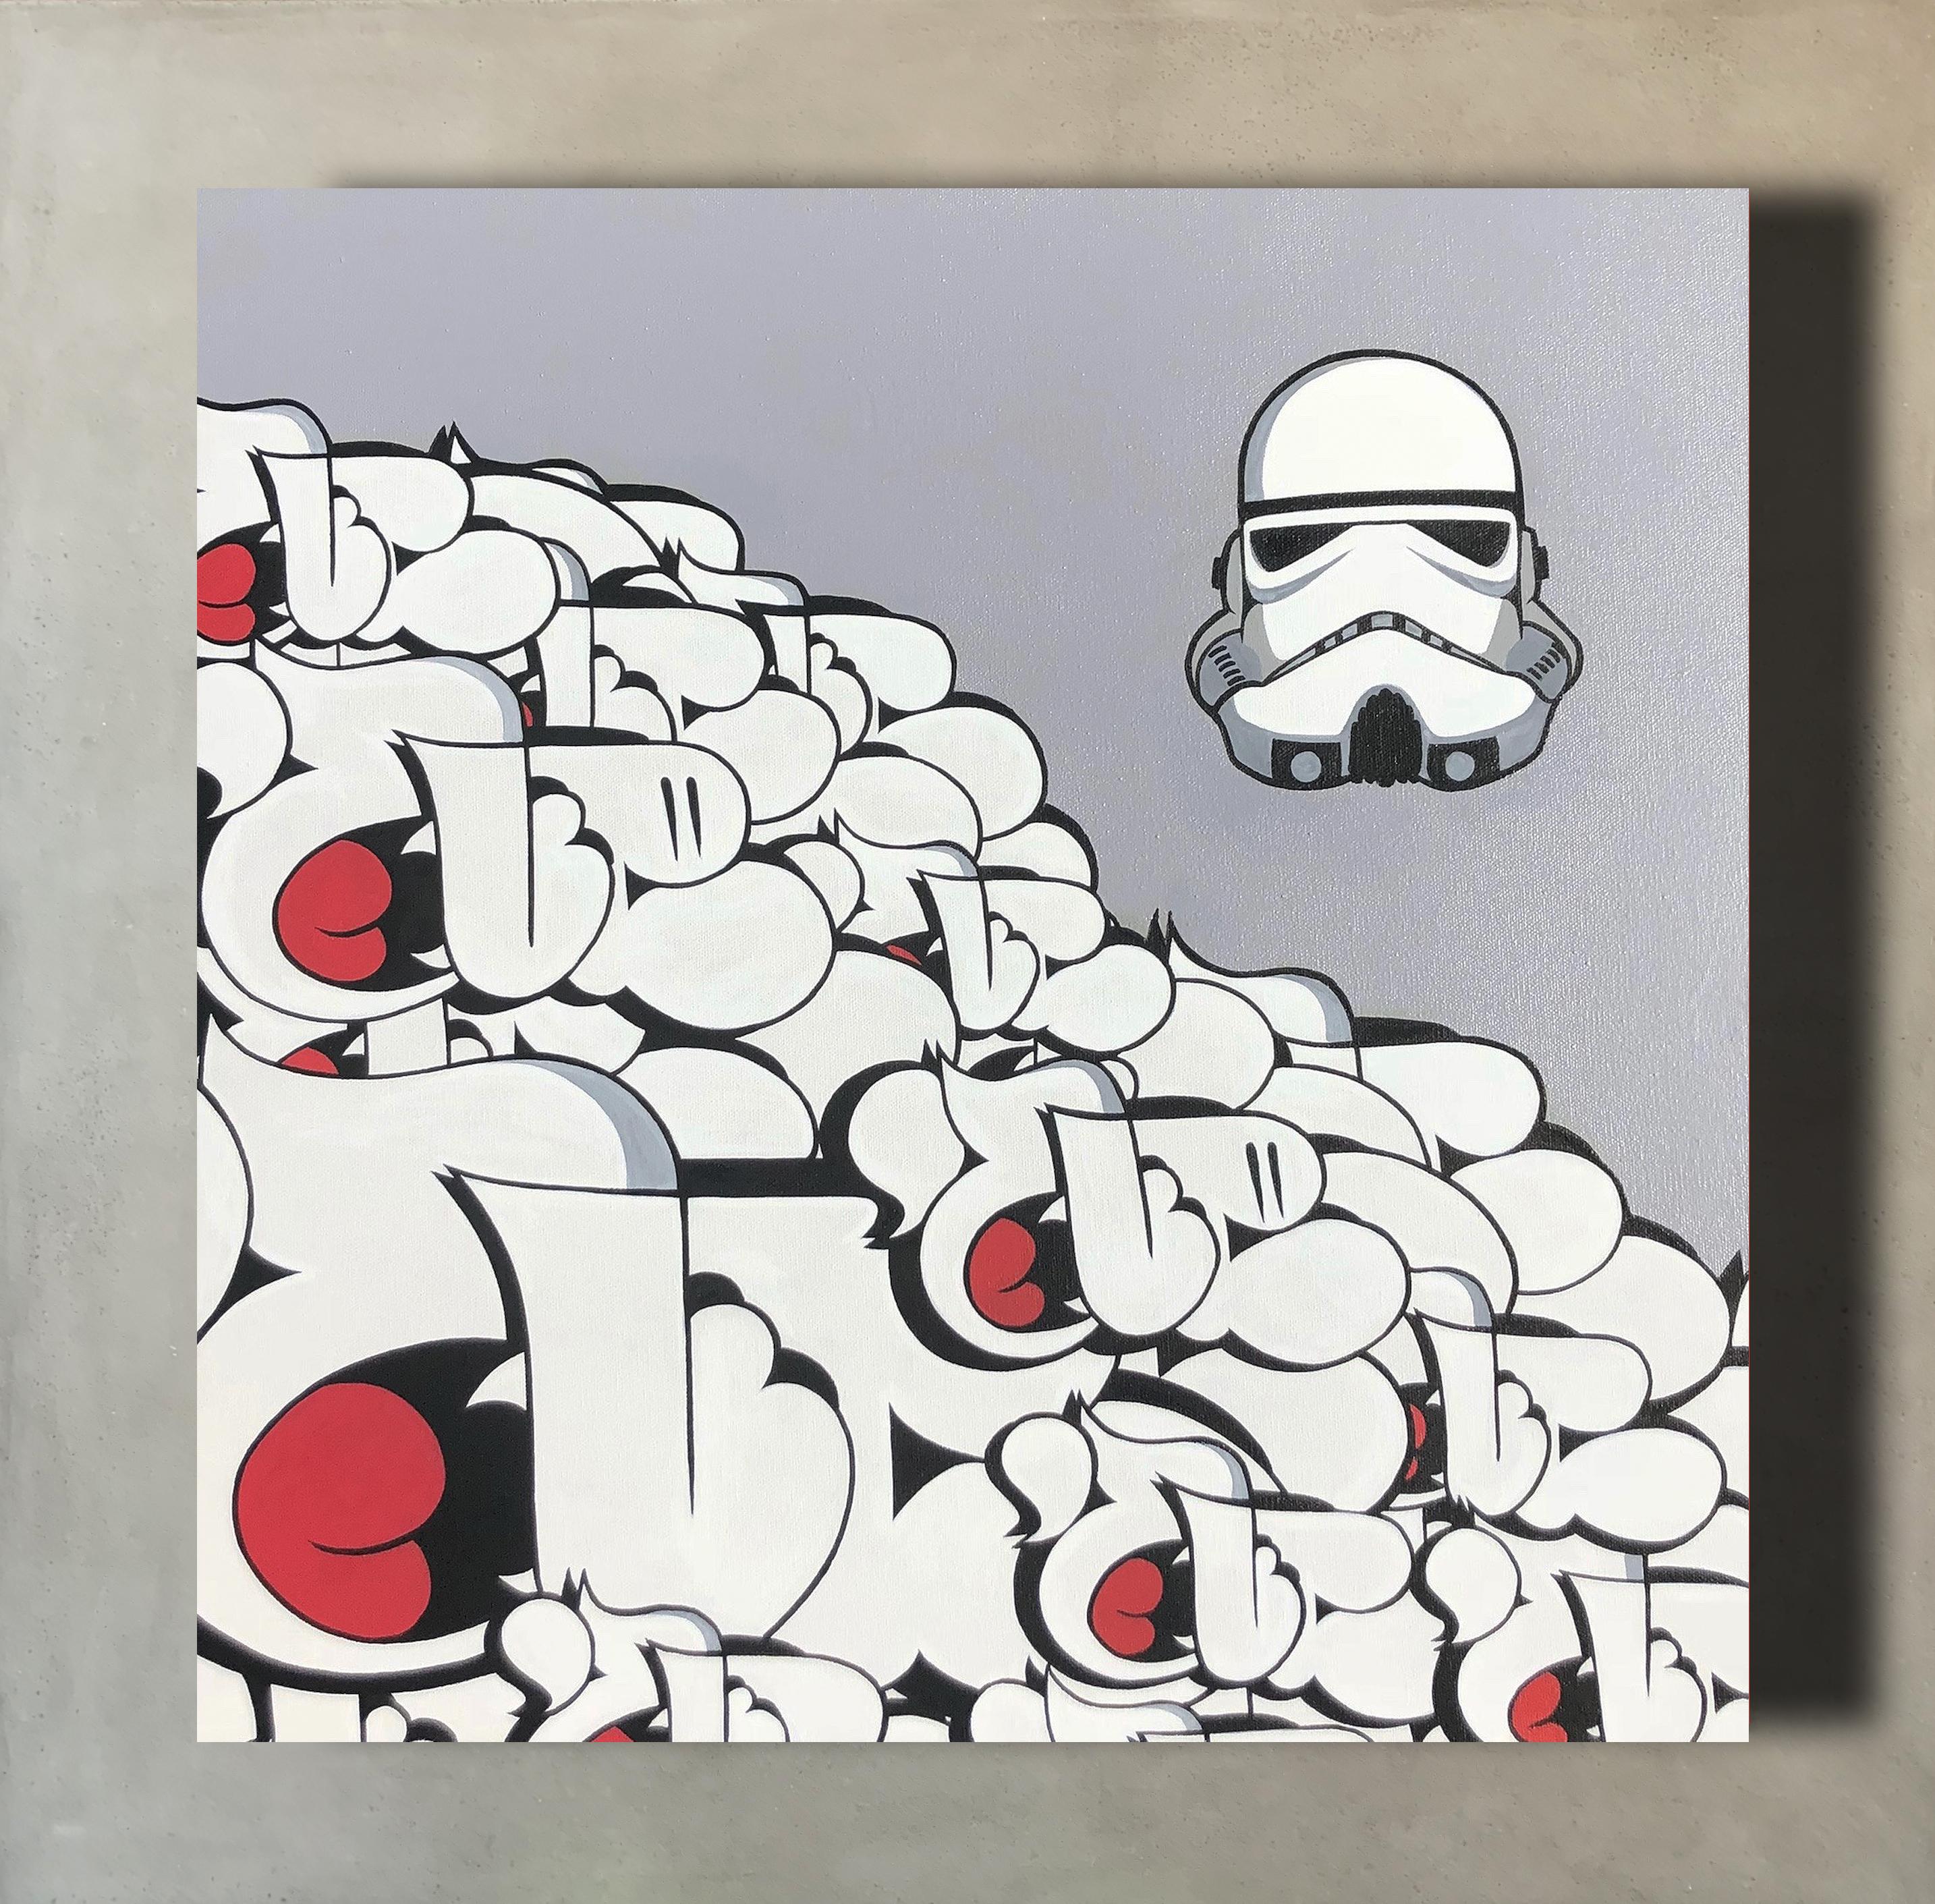 "Stormtrooper x Nover, 24x24"" Acrylic on Canvas, 2016."